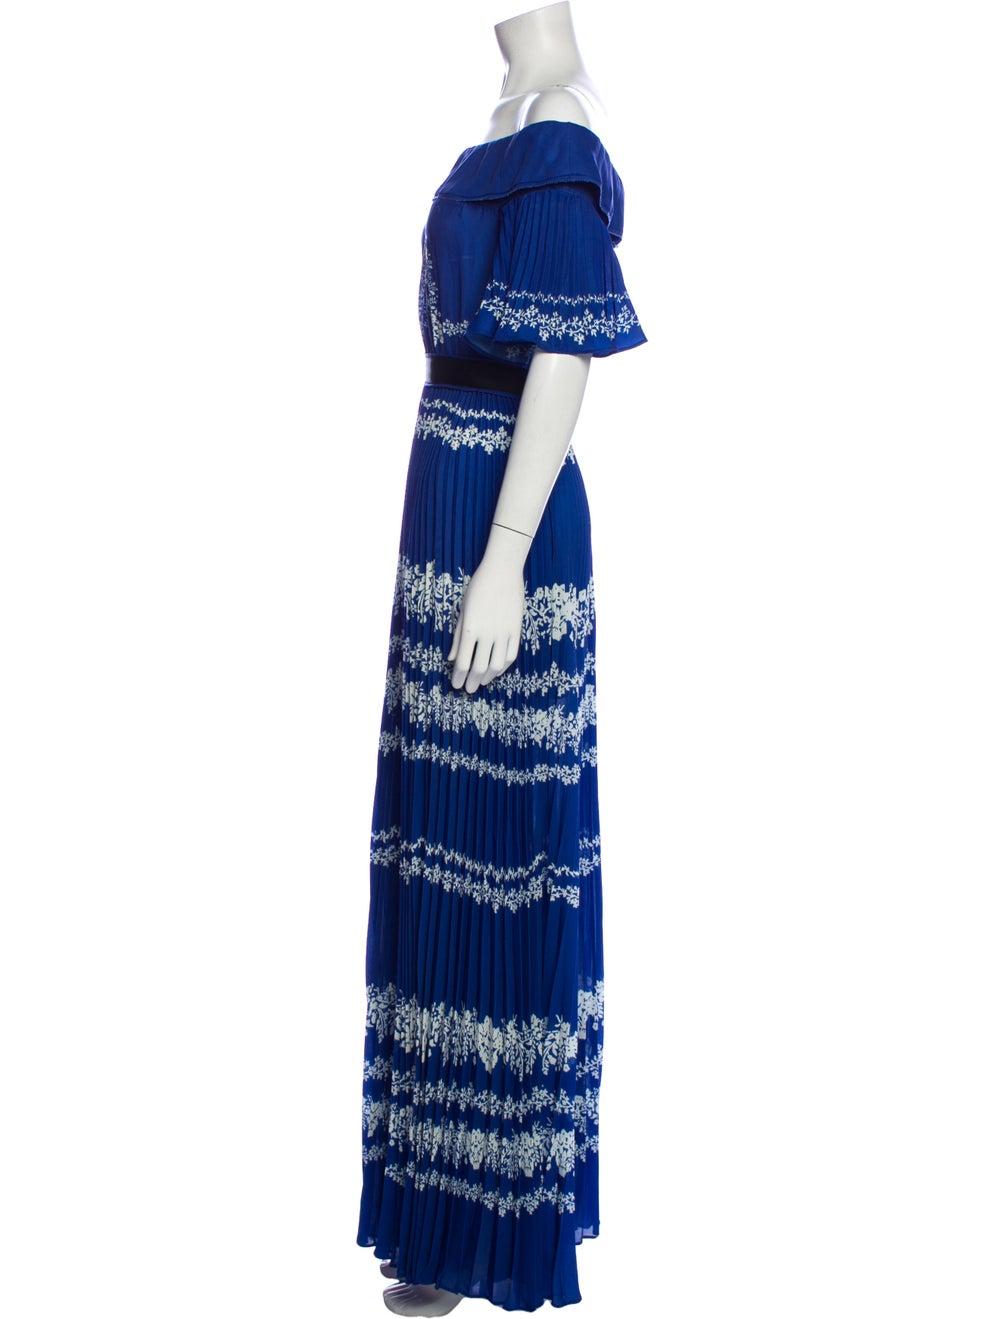 Self-Portrait Printed Long Dress Blue - image 2